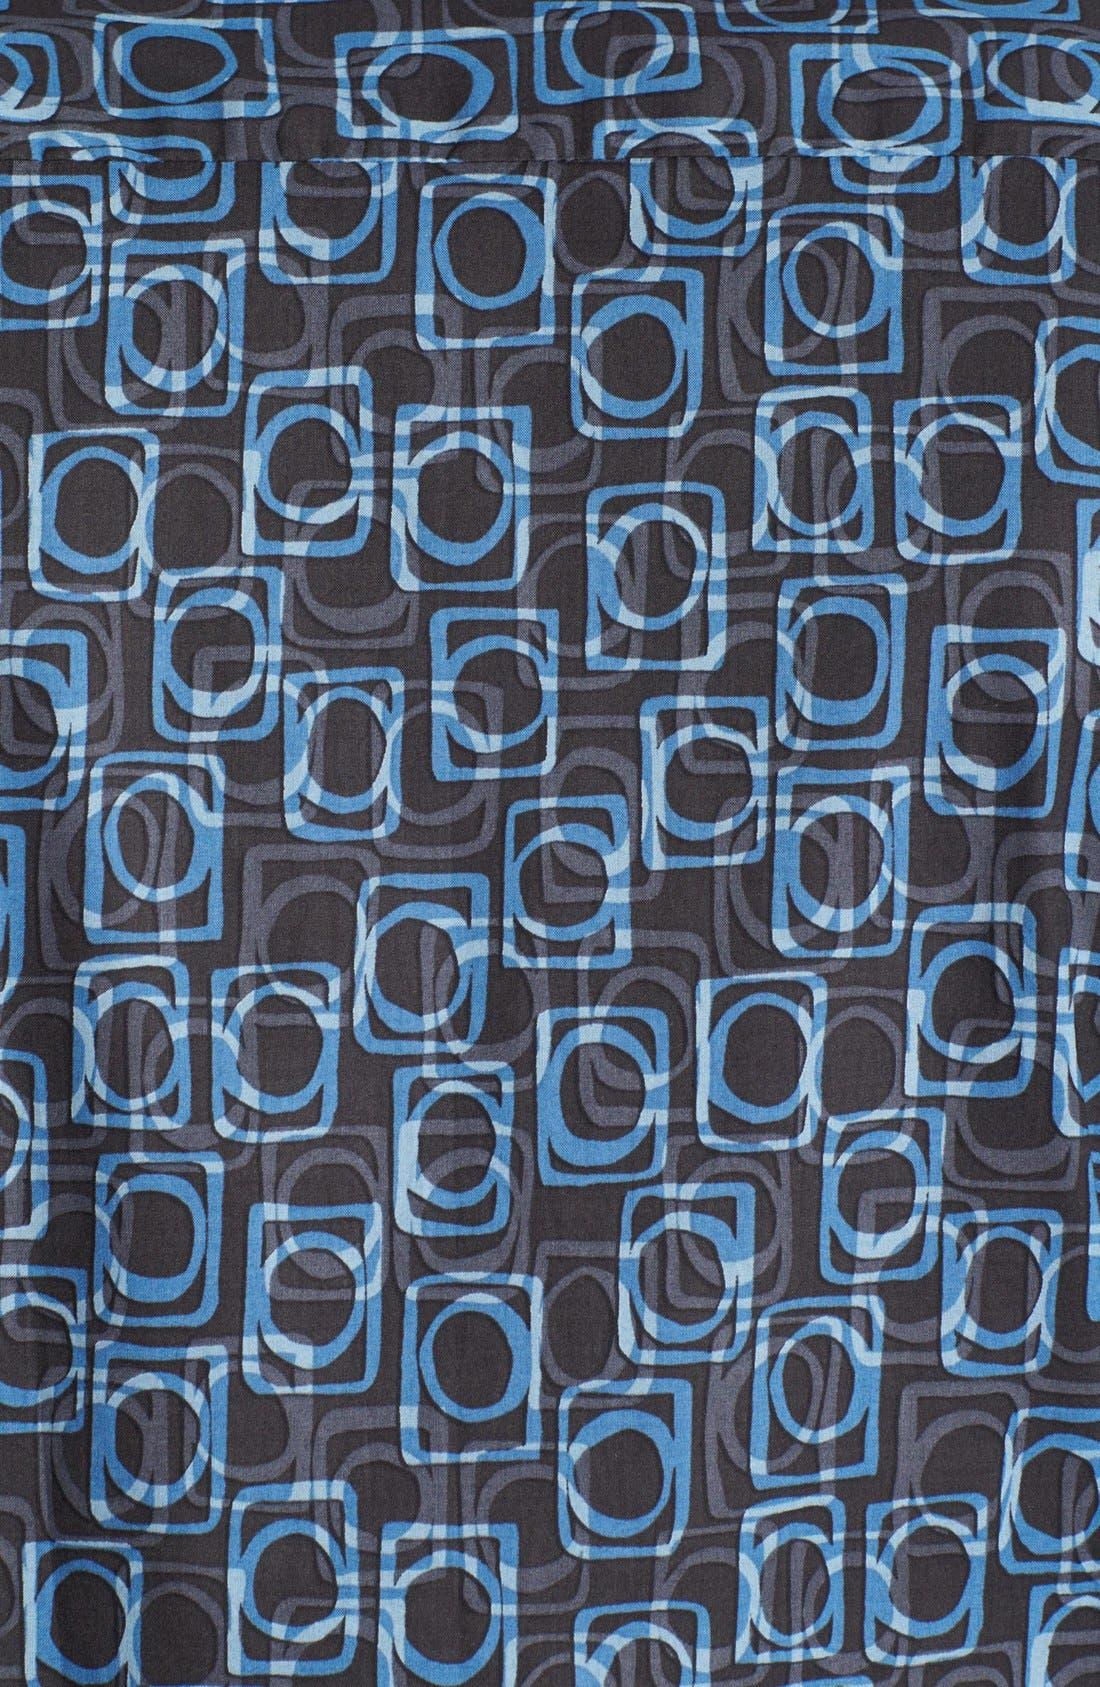 Alternate Image 3  - Tori Richard 'Eclipse' Cotton Lawn Campshirt